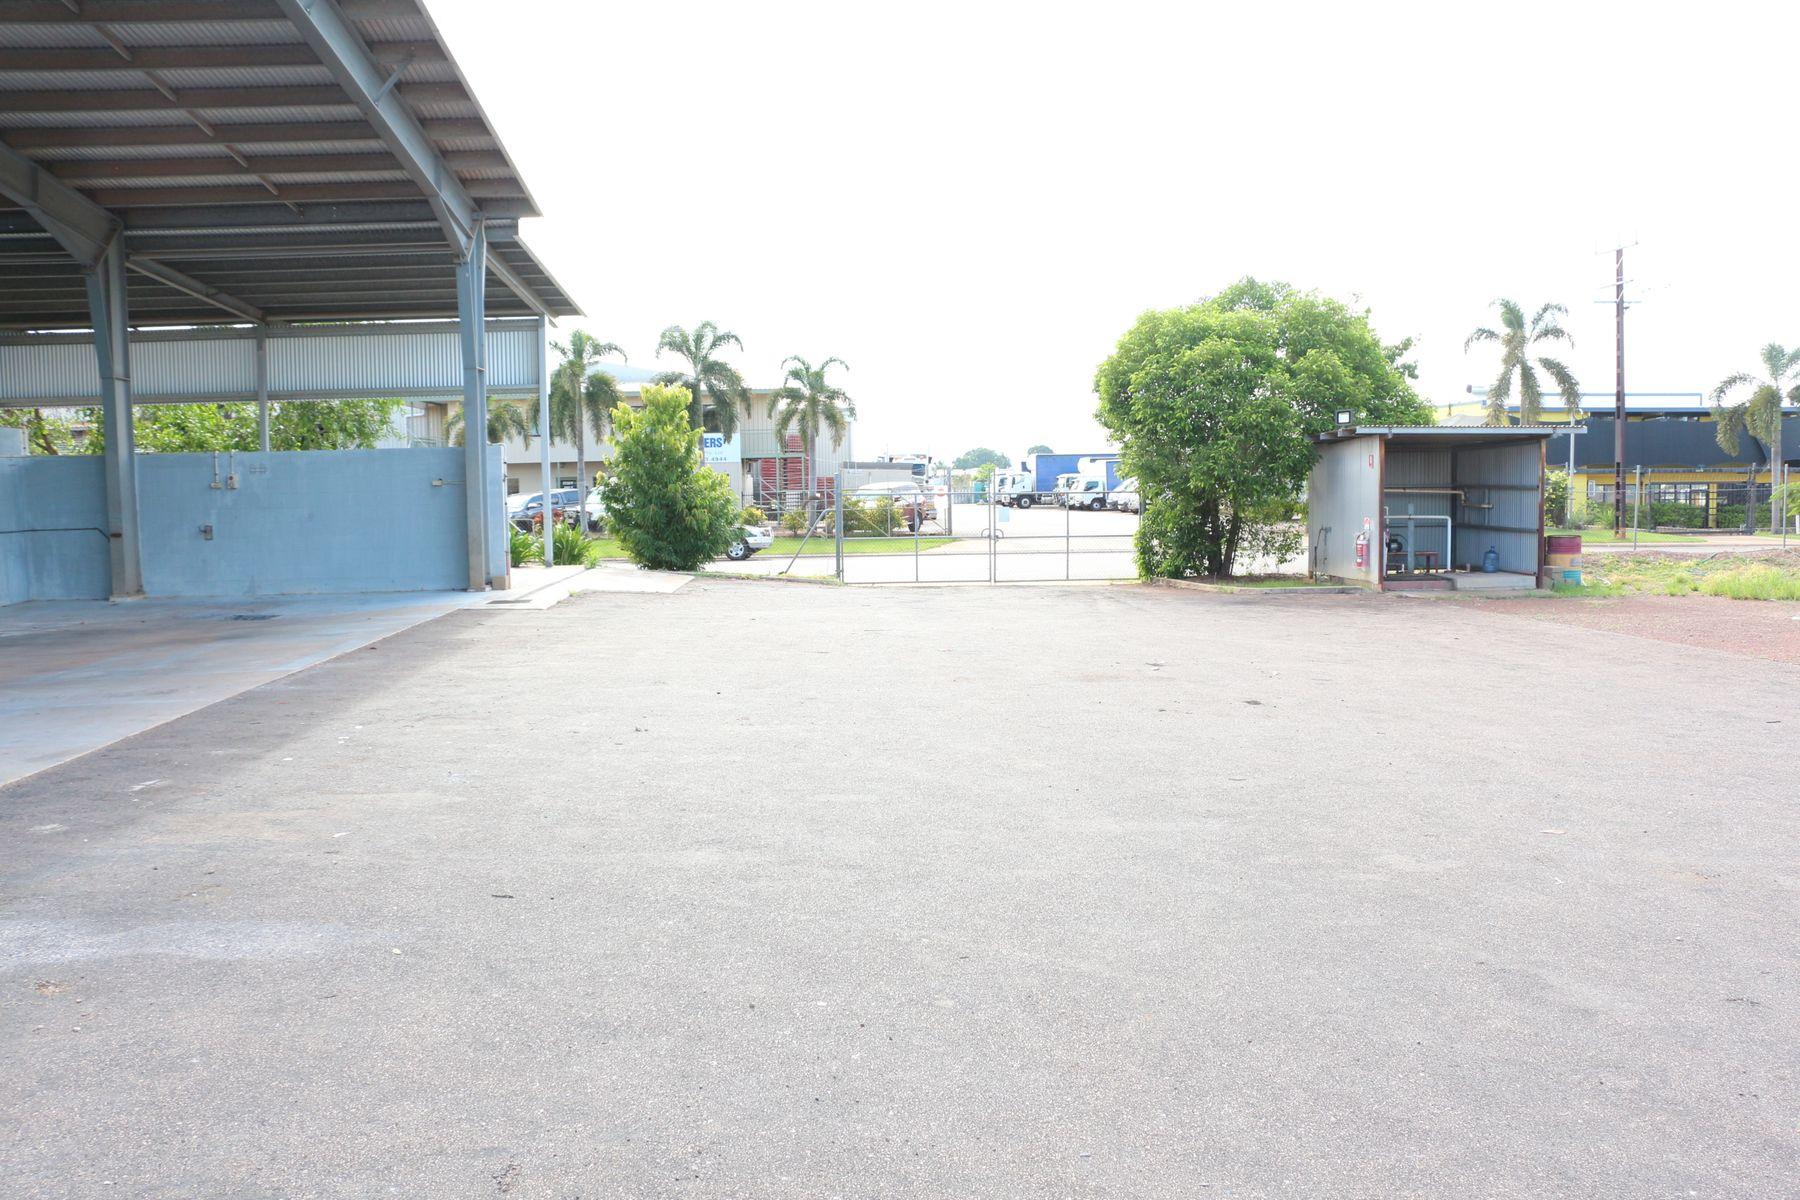 20 Anictomatis Road, Berrimah, NT 0828